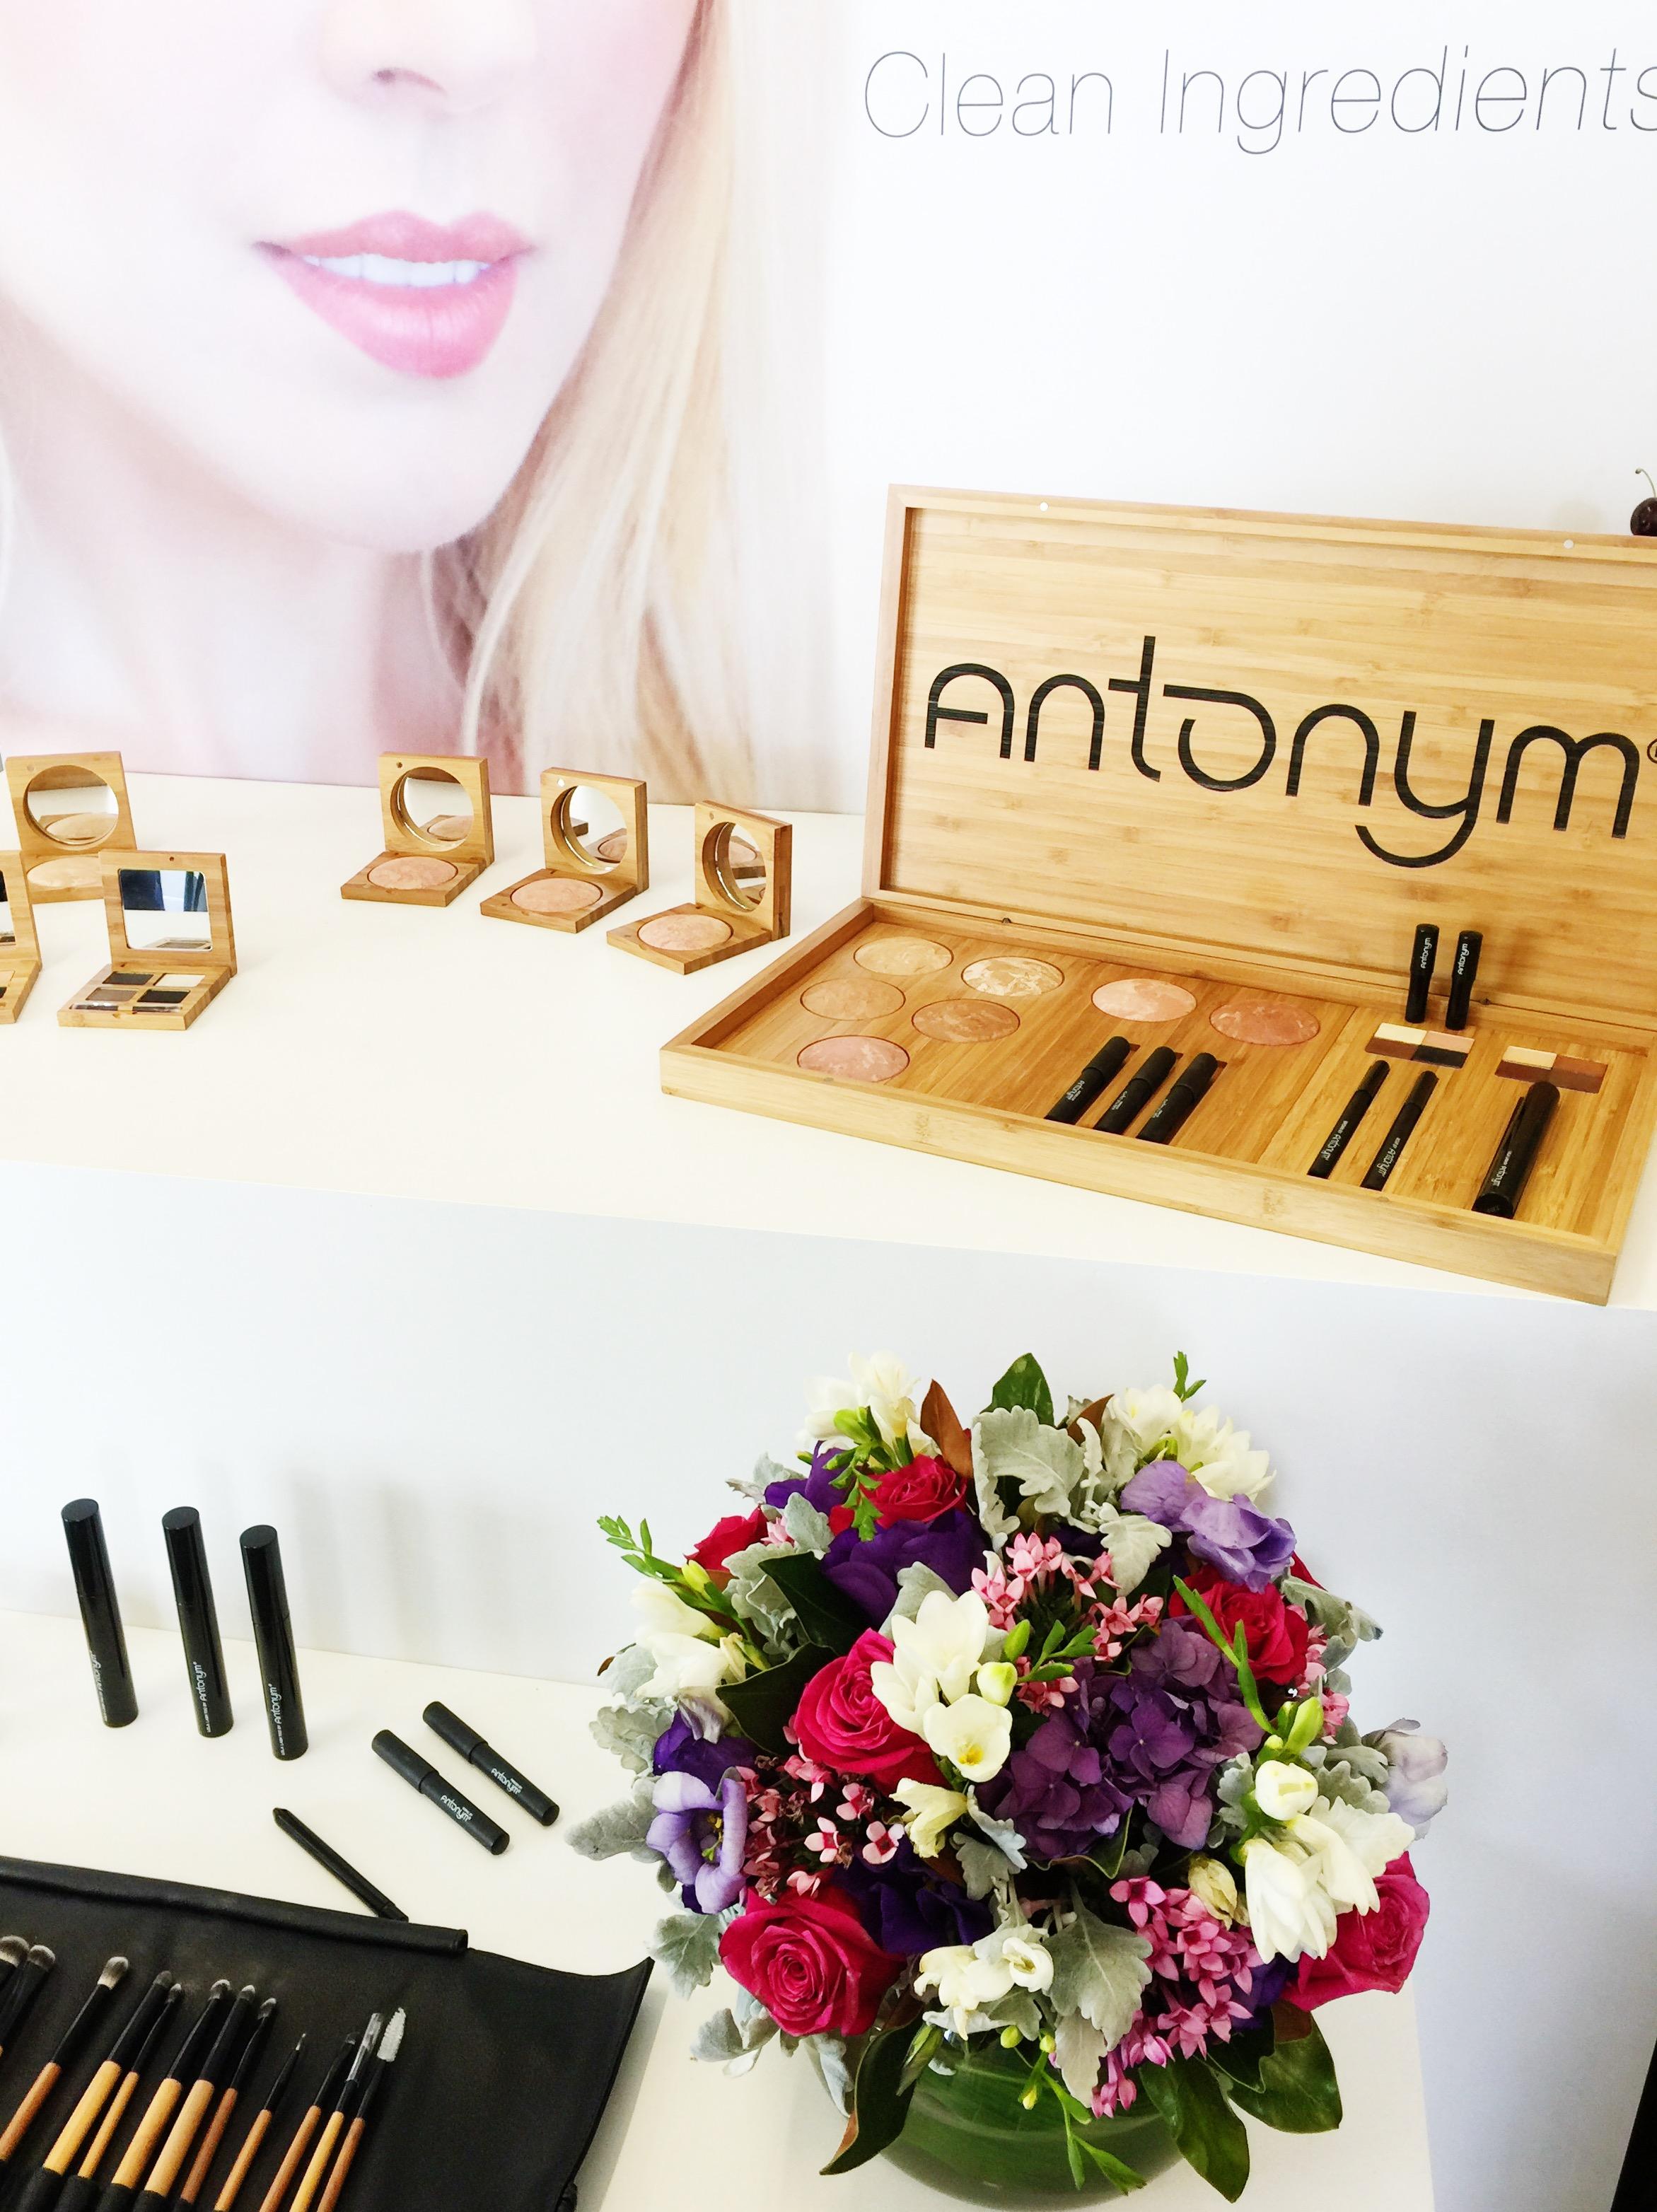 Marisa Robinson Beauty Blogger Sephora Exclusive Brands Showcase 2017 Antonym